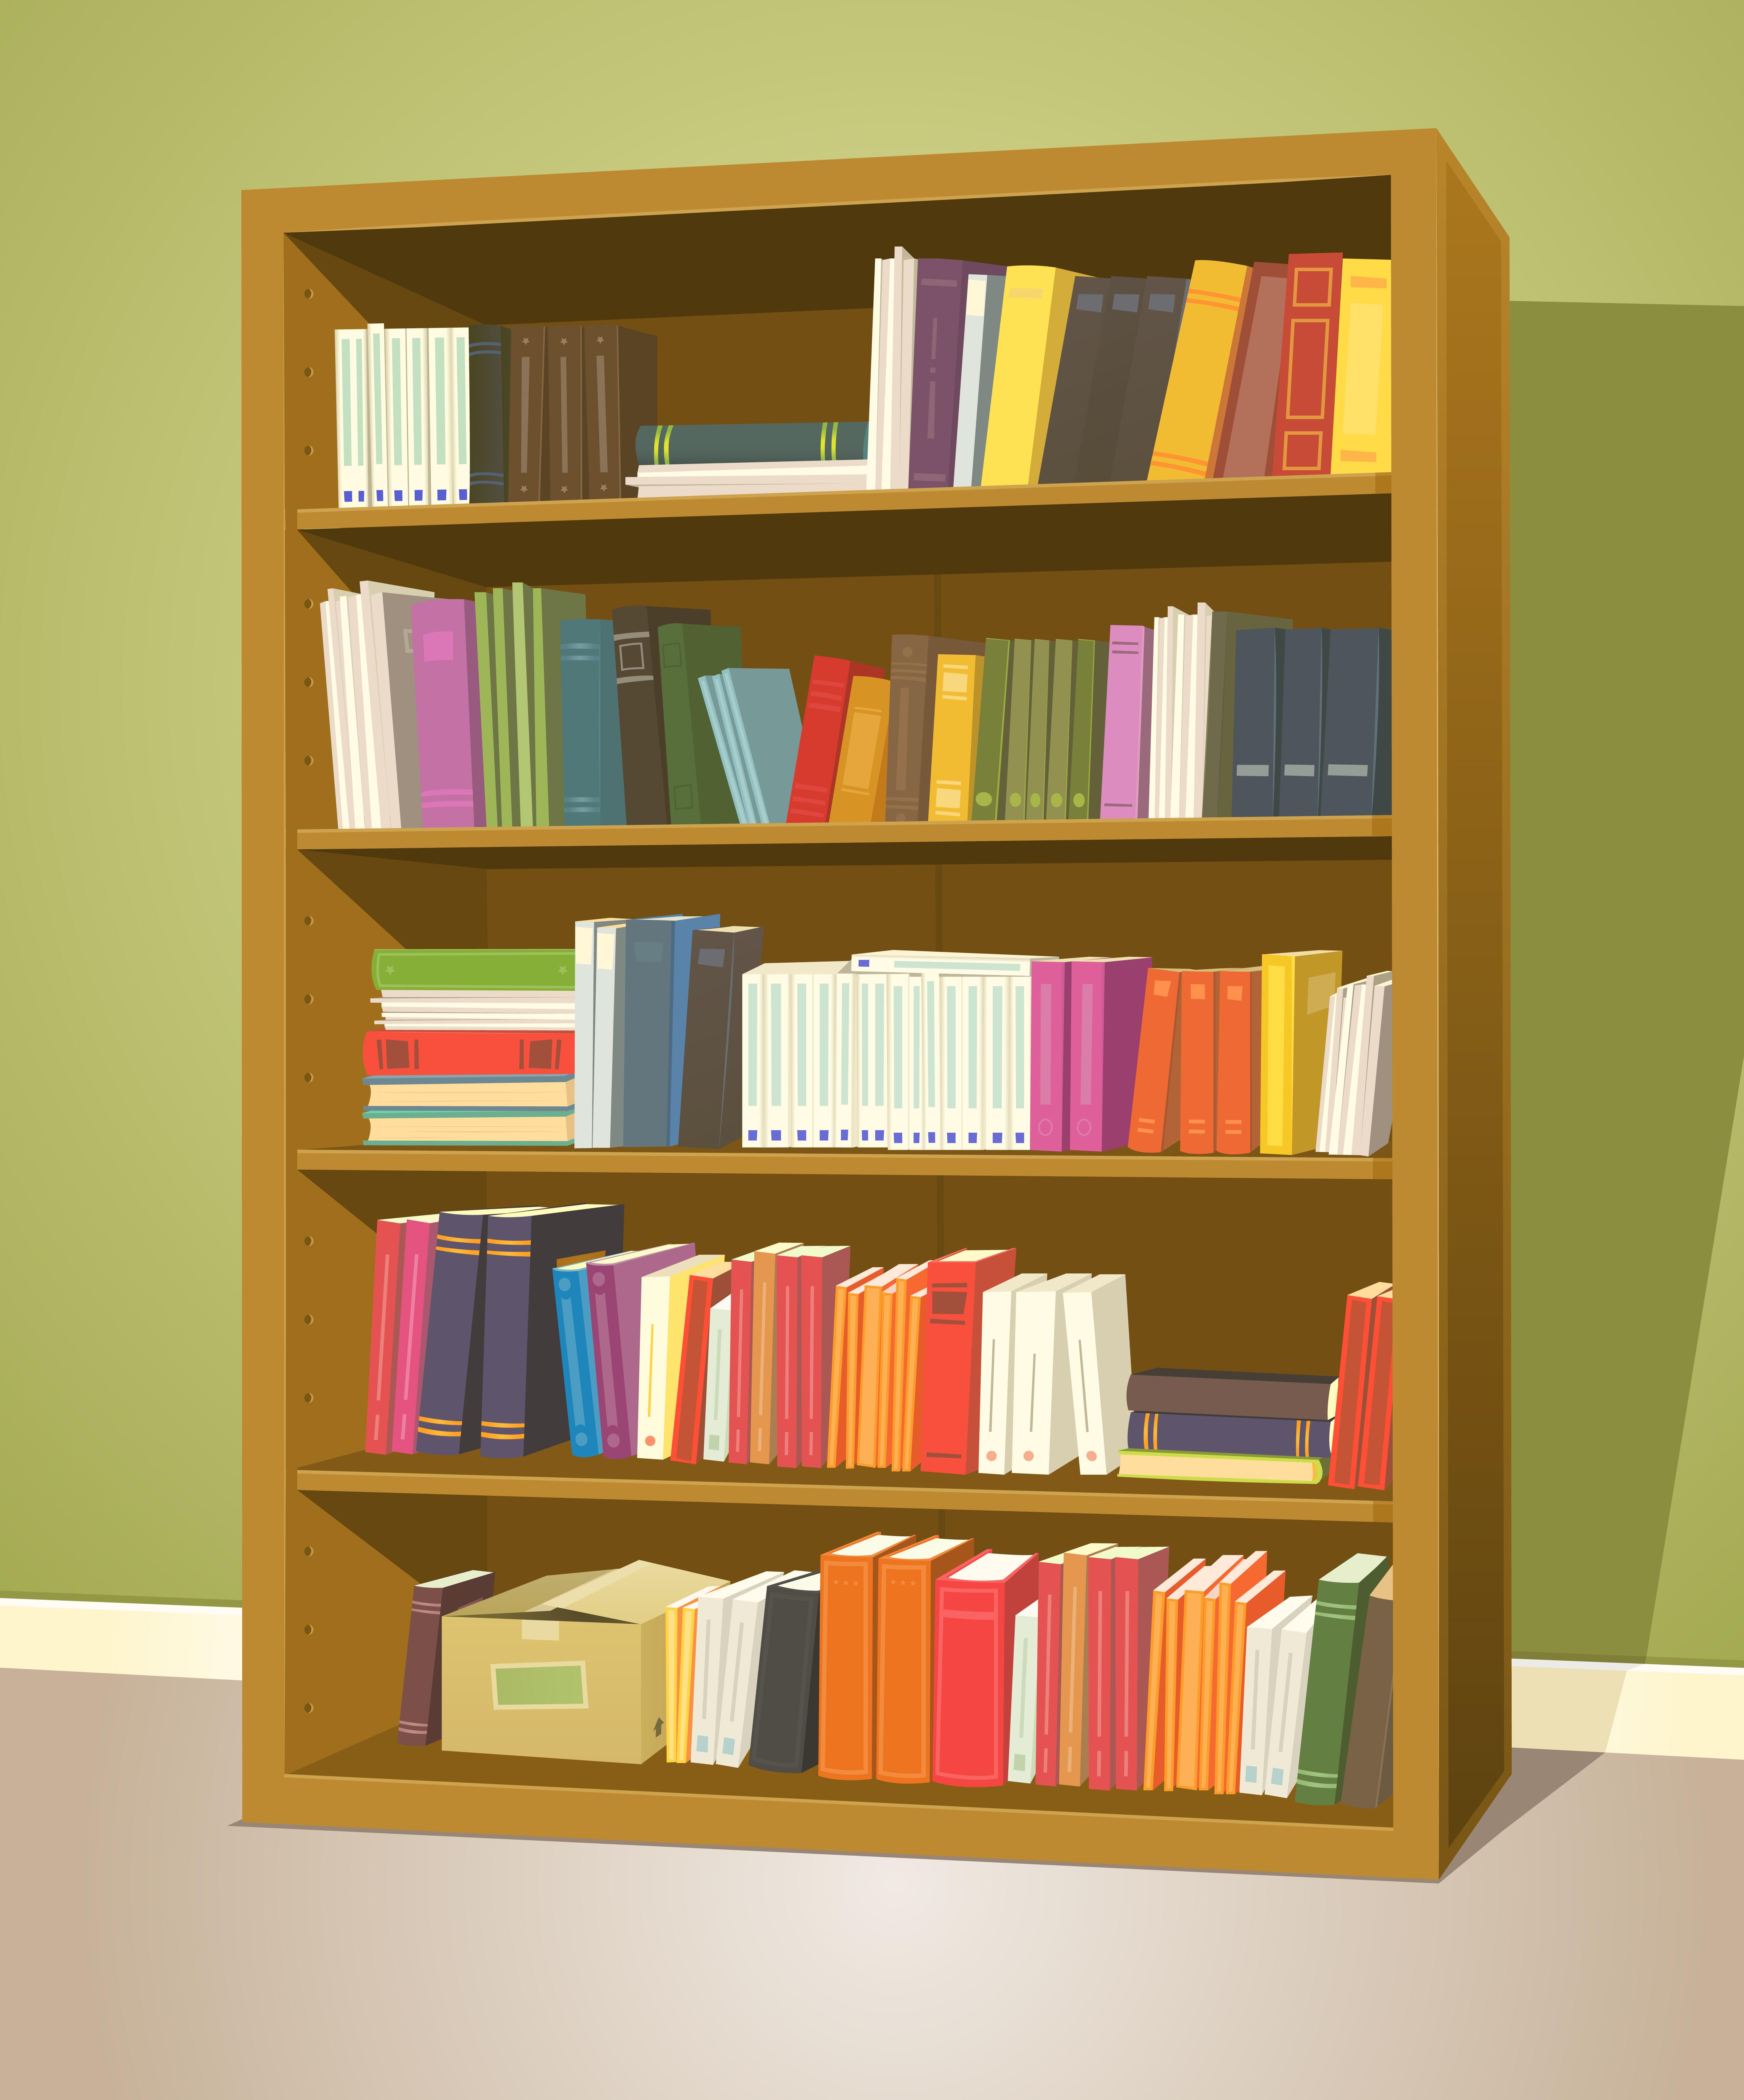 Library Bookshelf - Download Free Vectors, Clipart ...